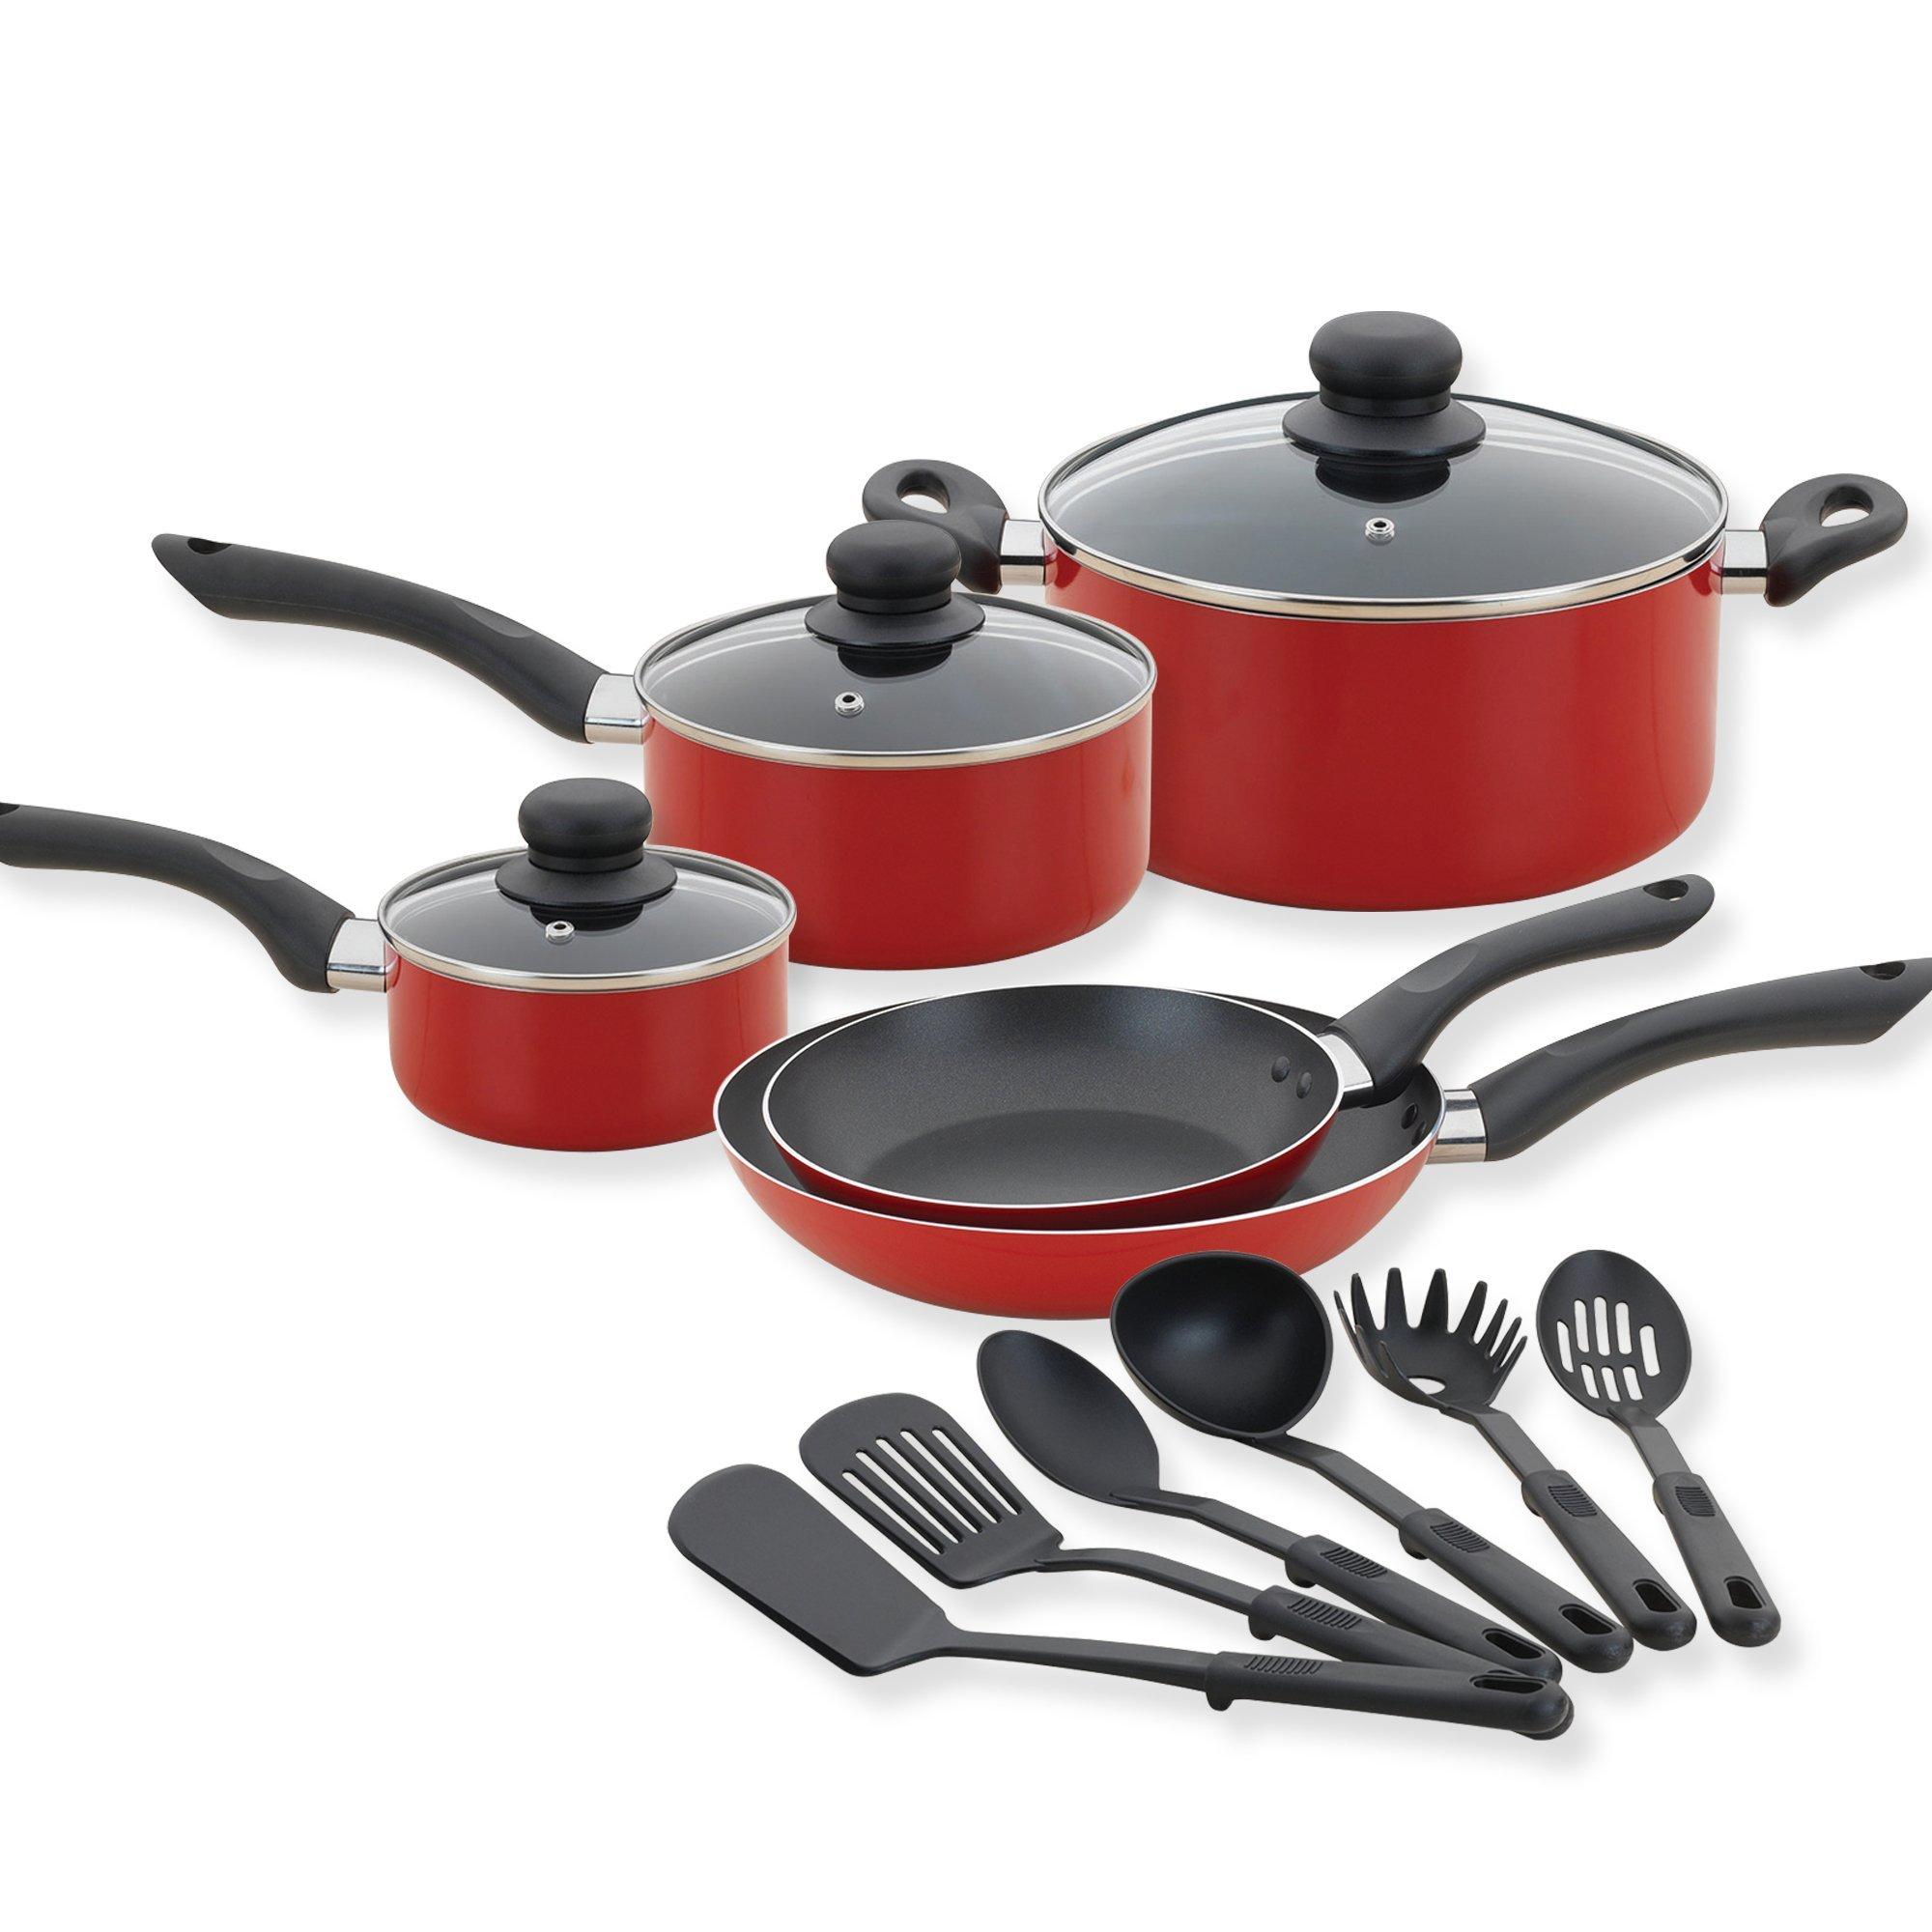 Betty Crocker 80180 14 Piece Cookware Set- Kitchen Pots and Pans Set Nonstick with Cooking Utensils - Non Stick Cookware Set PTFE and PFOA Free Basics Pots and Pans - Red by Betty Crocker